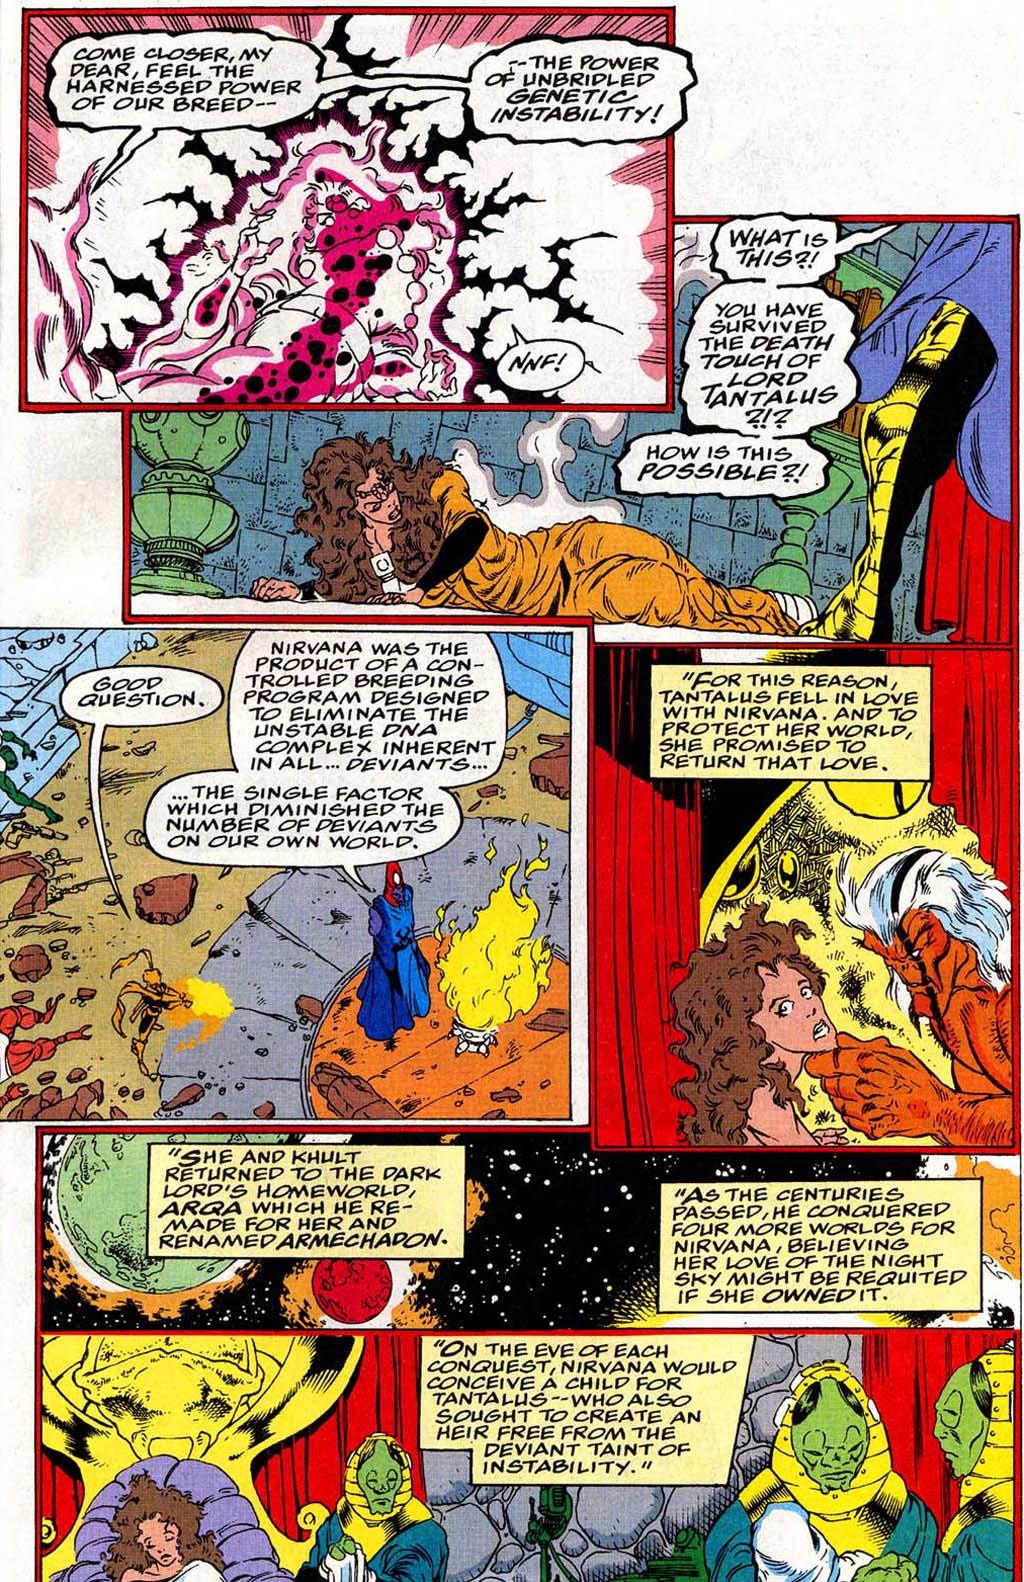 Read online Blackwulf comic -  Issue #9 - 14